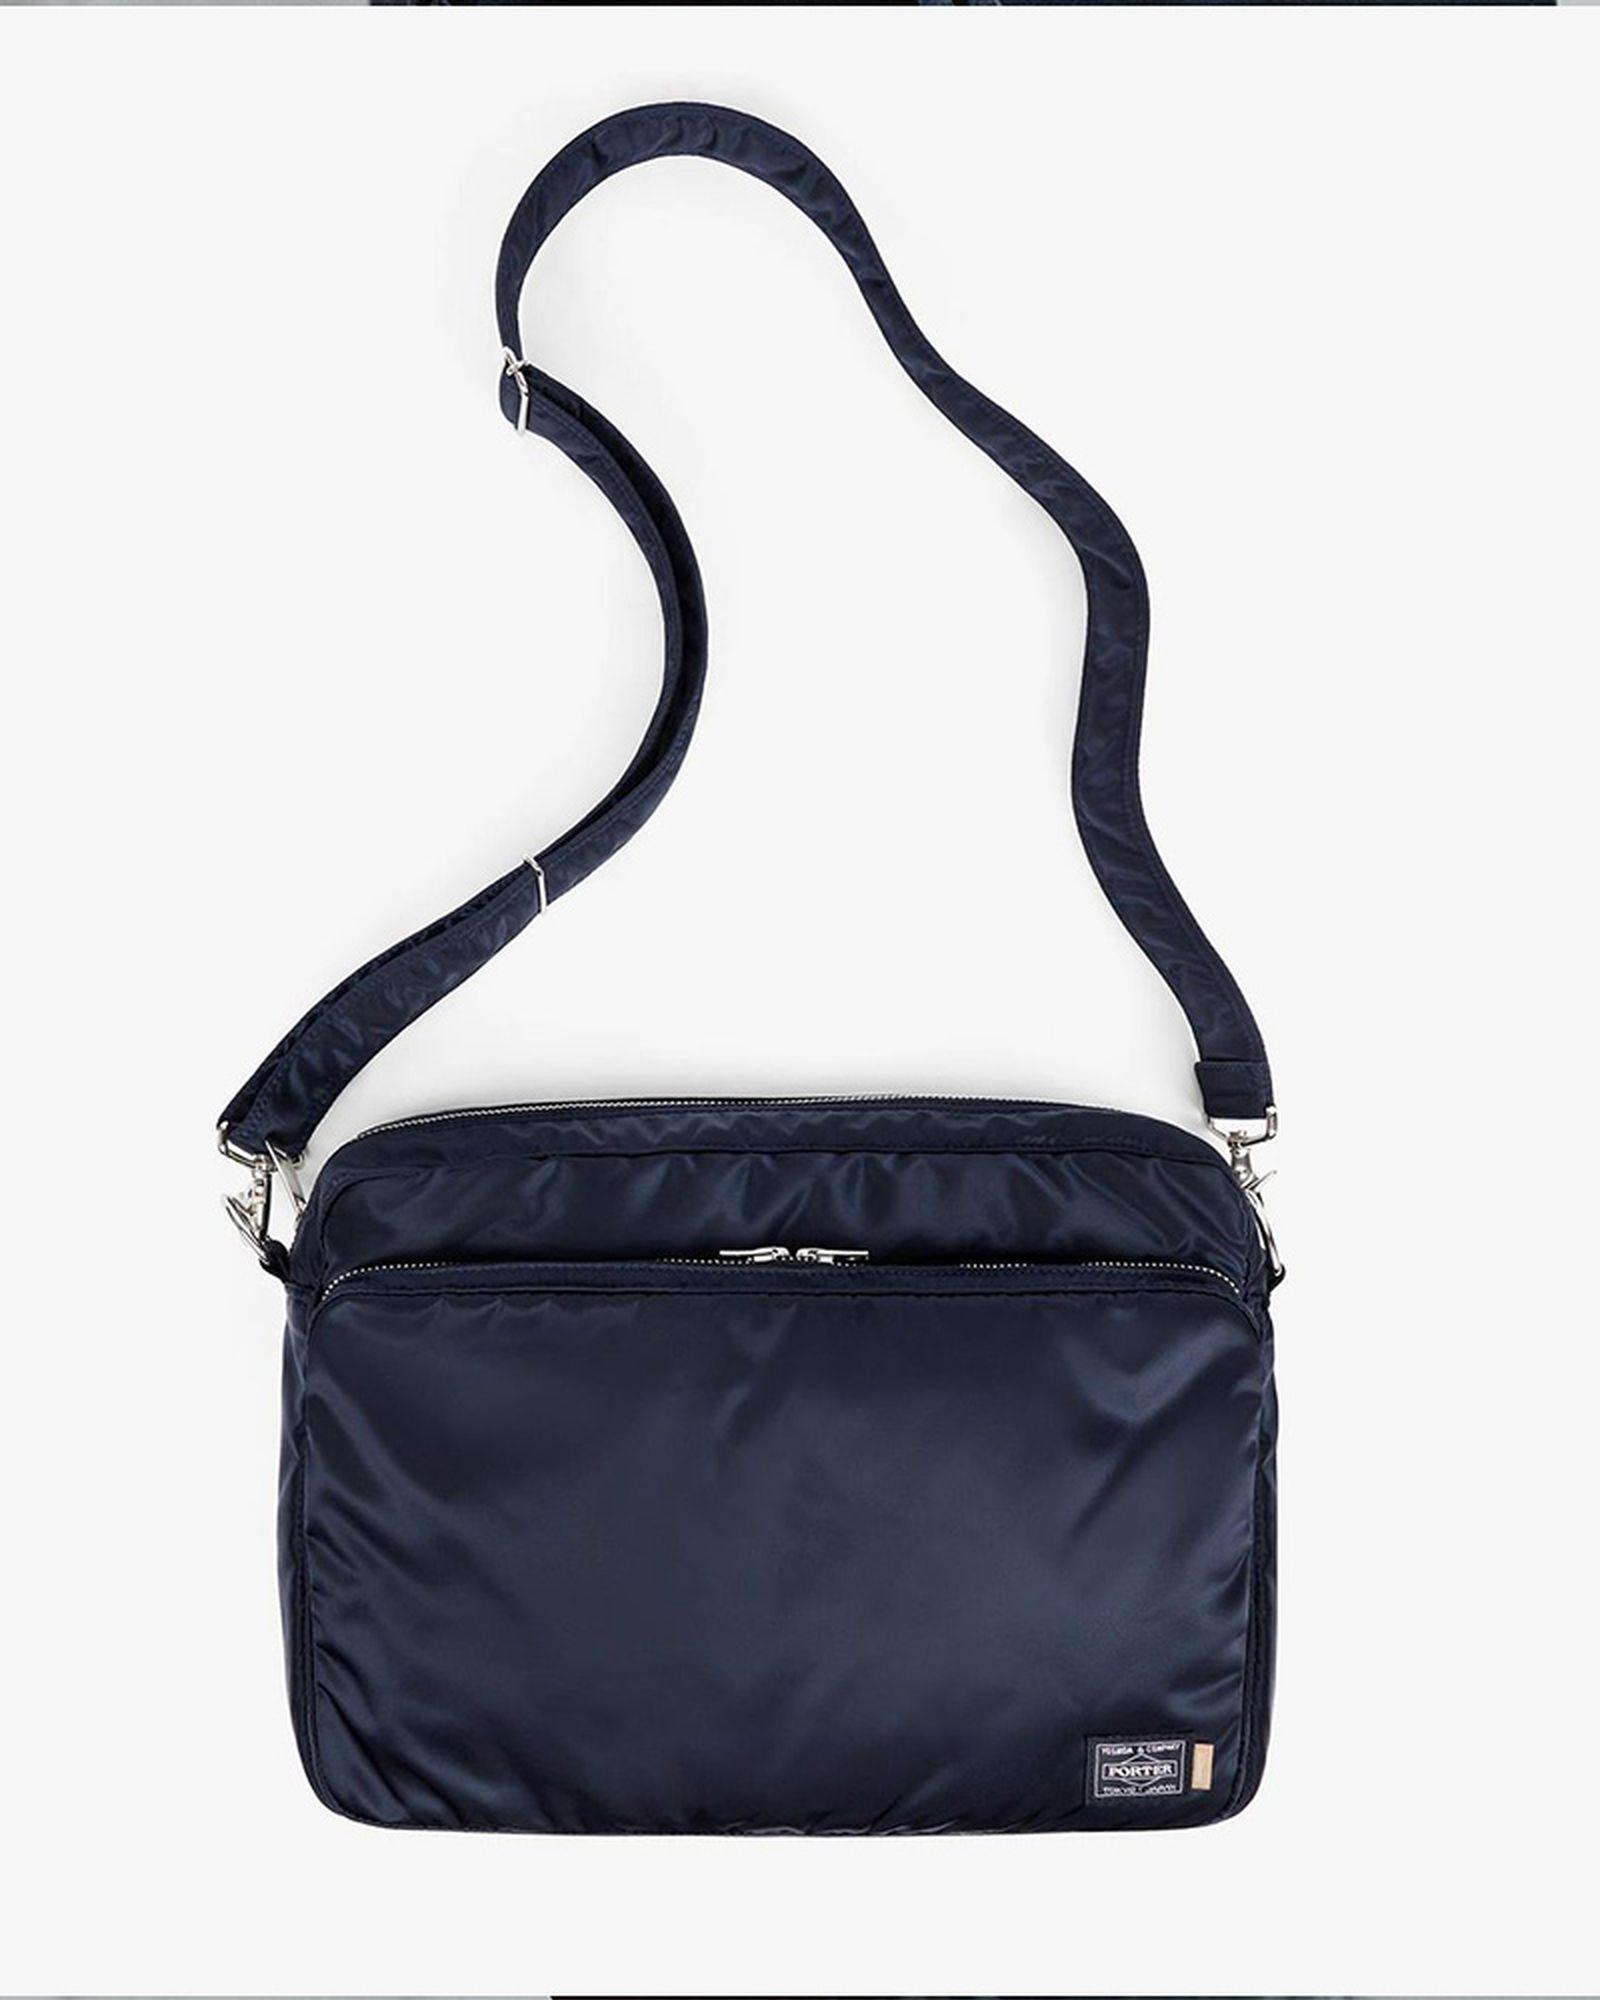 jjjjound-porter-bags-release-date-info-07